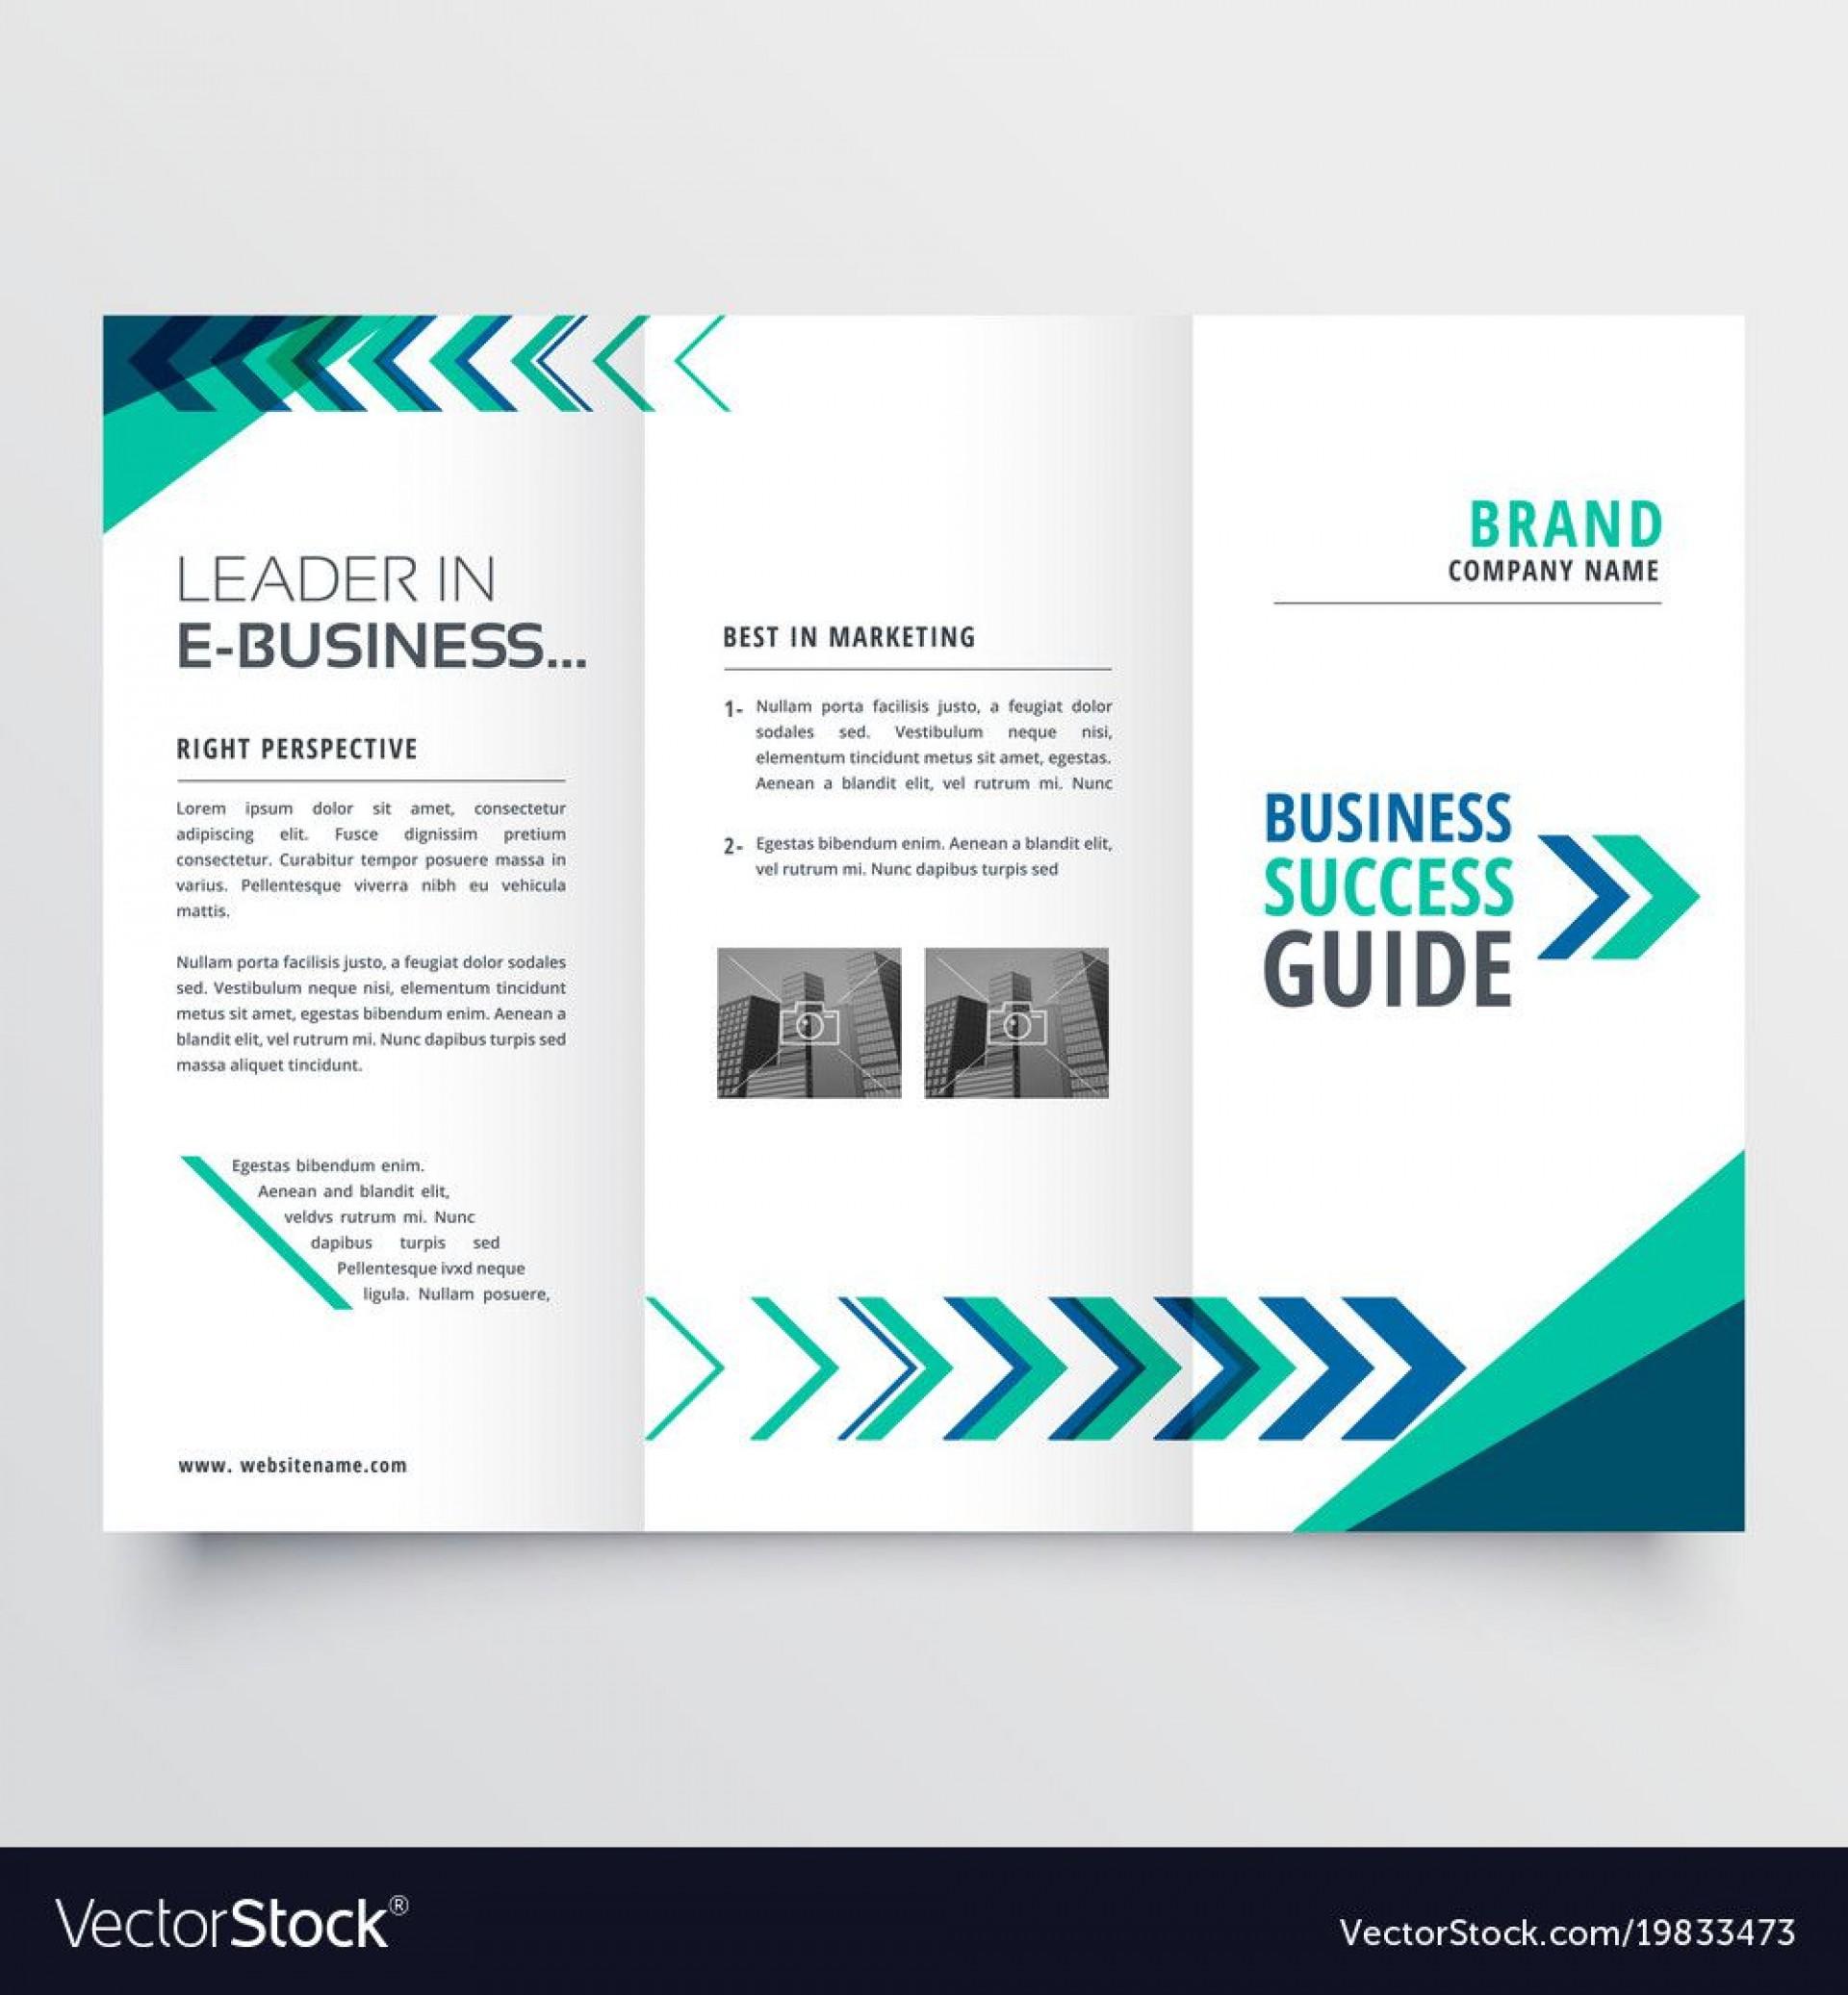 003 Beautiful Word Tri Fold Brochure Template Idea  2010 Microsoft M Office1920